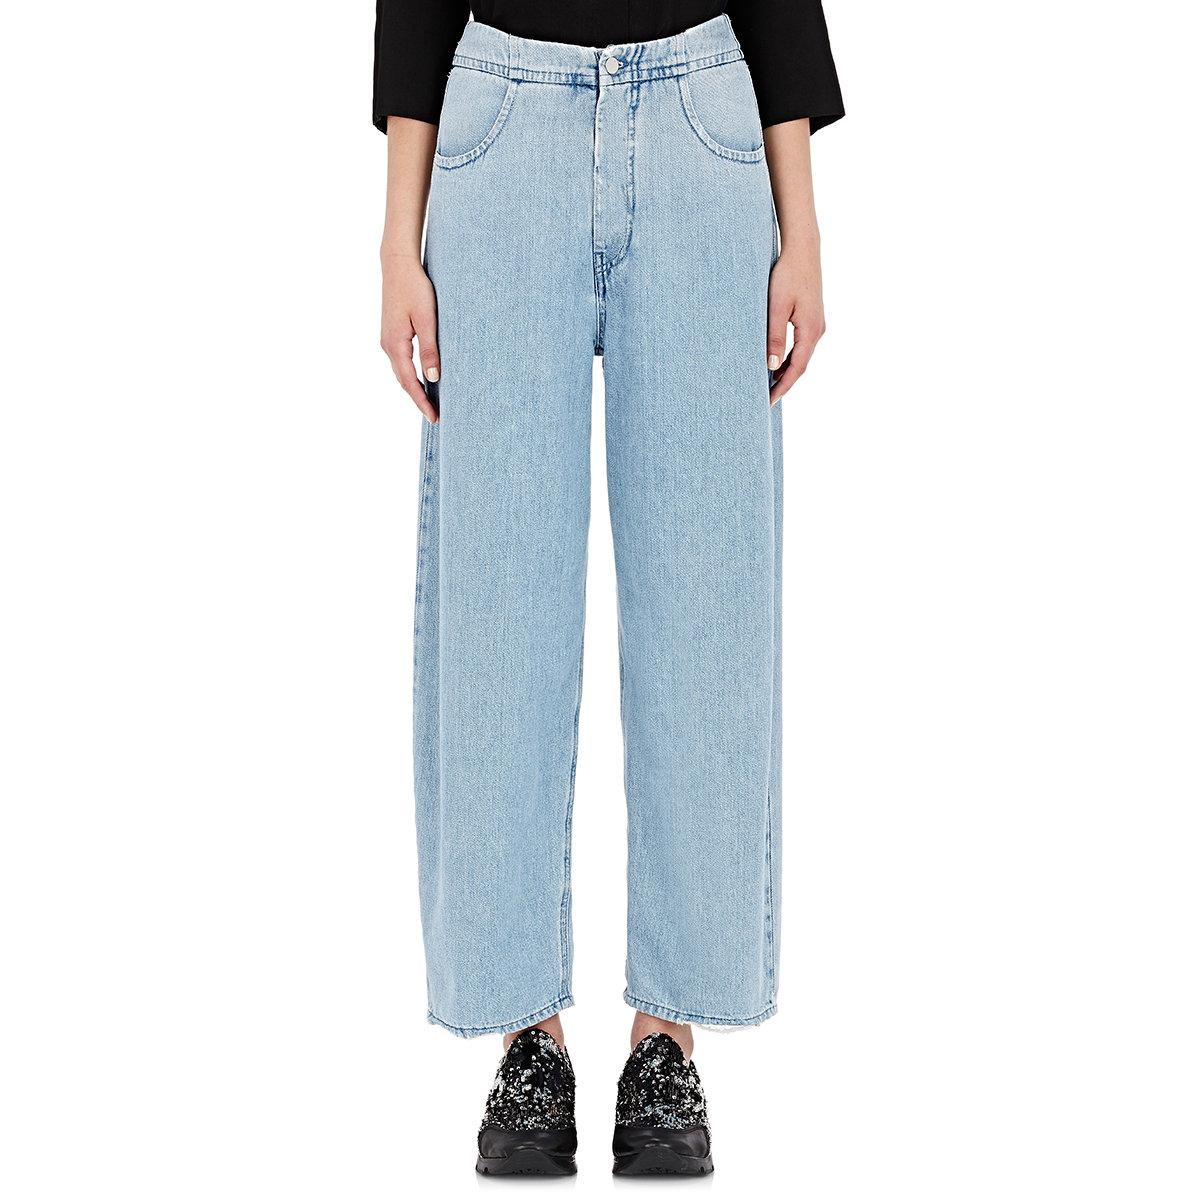 high-waist flared trousers - Blue Maison Martin Margiela aXOytS